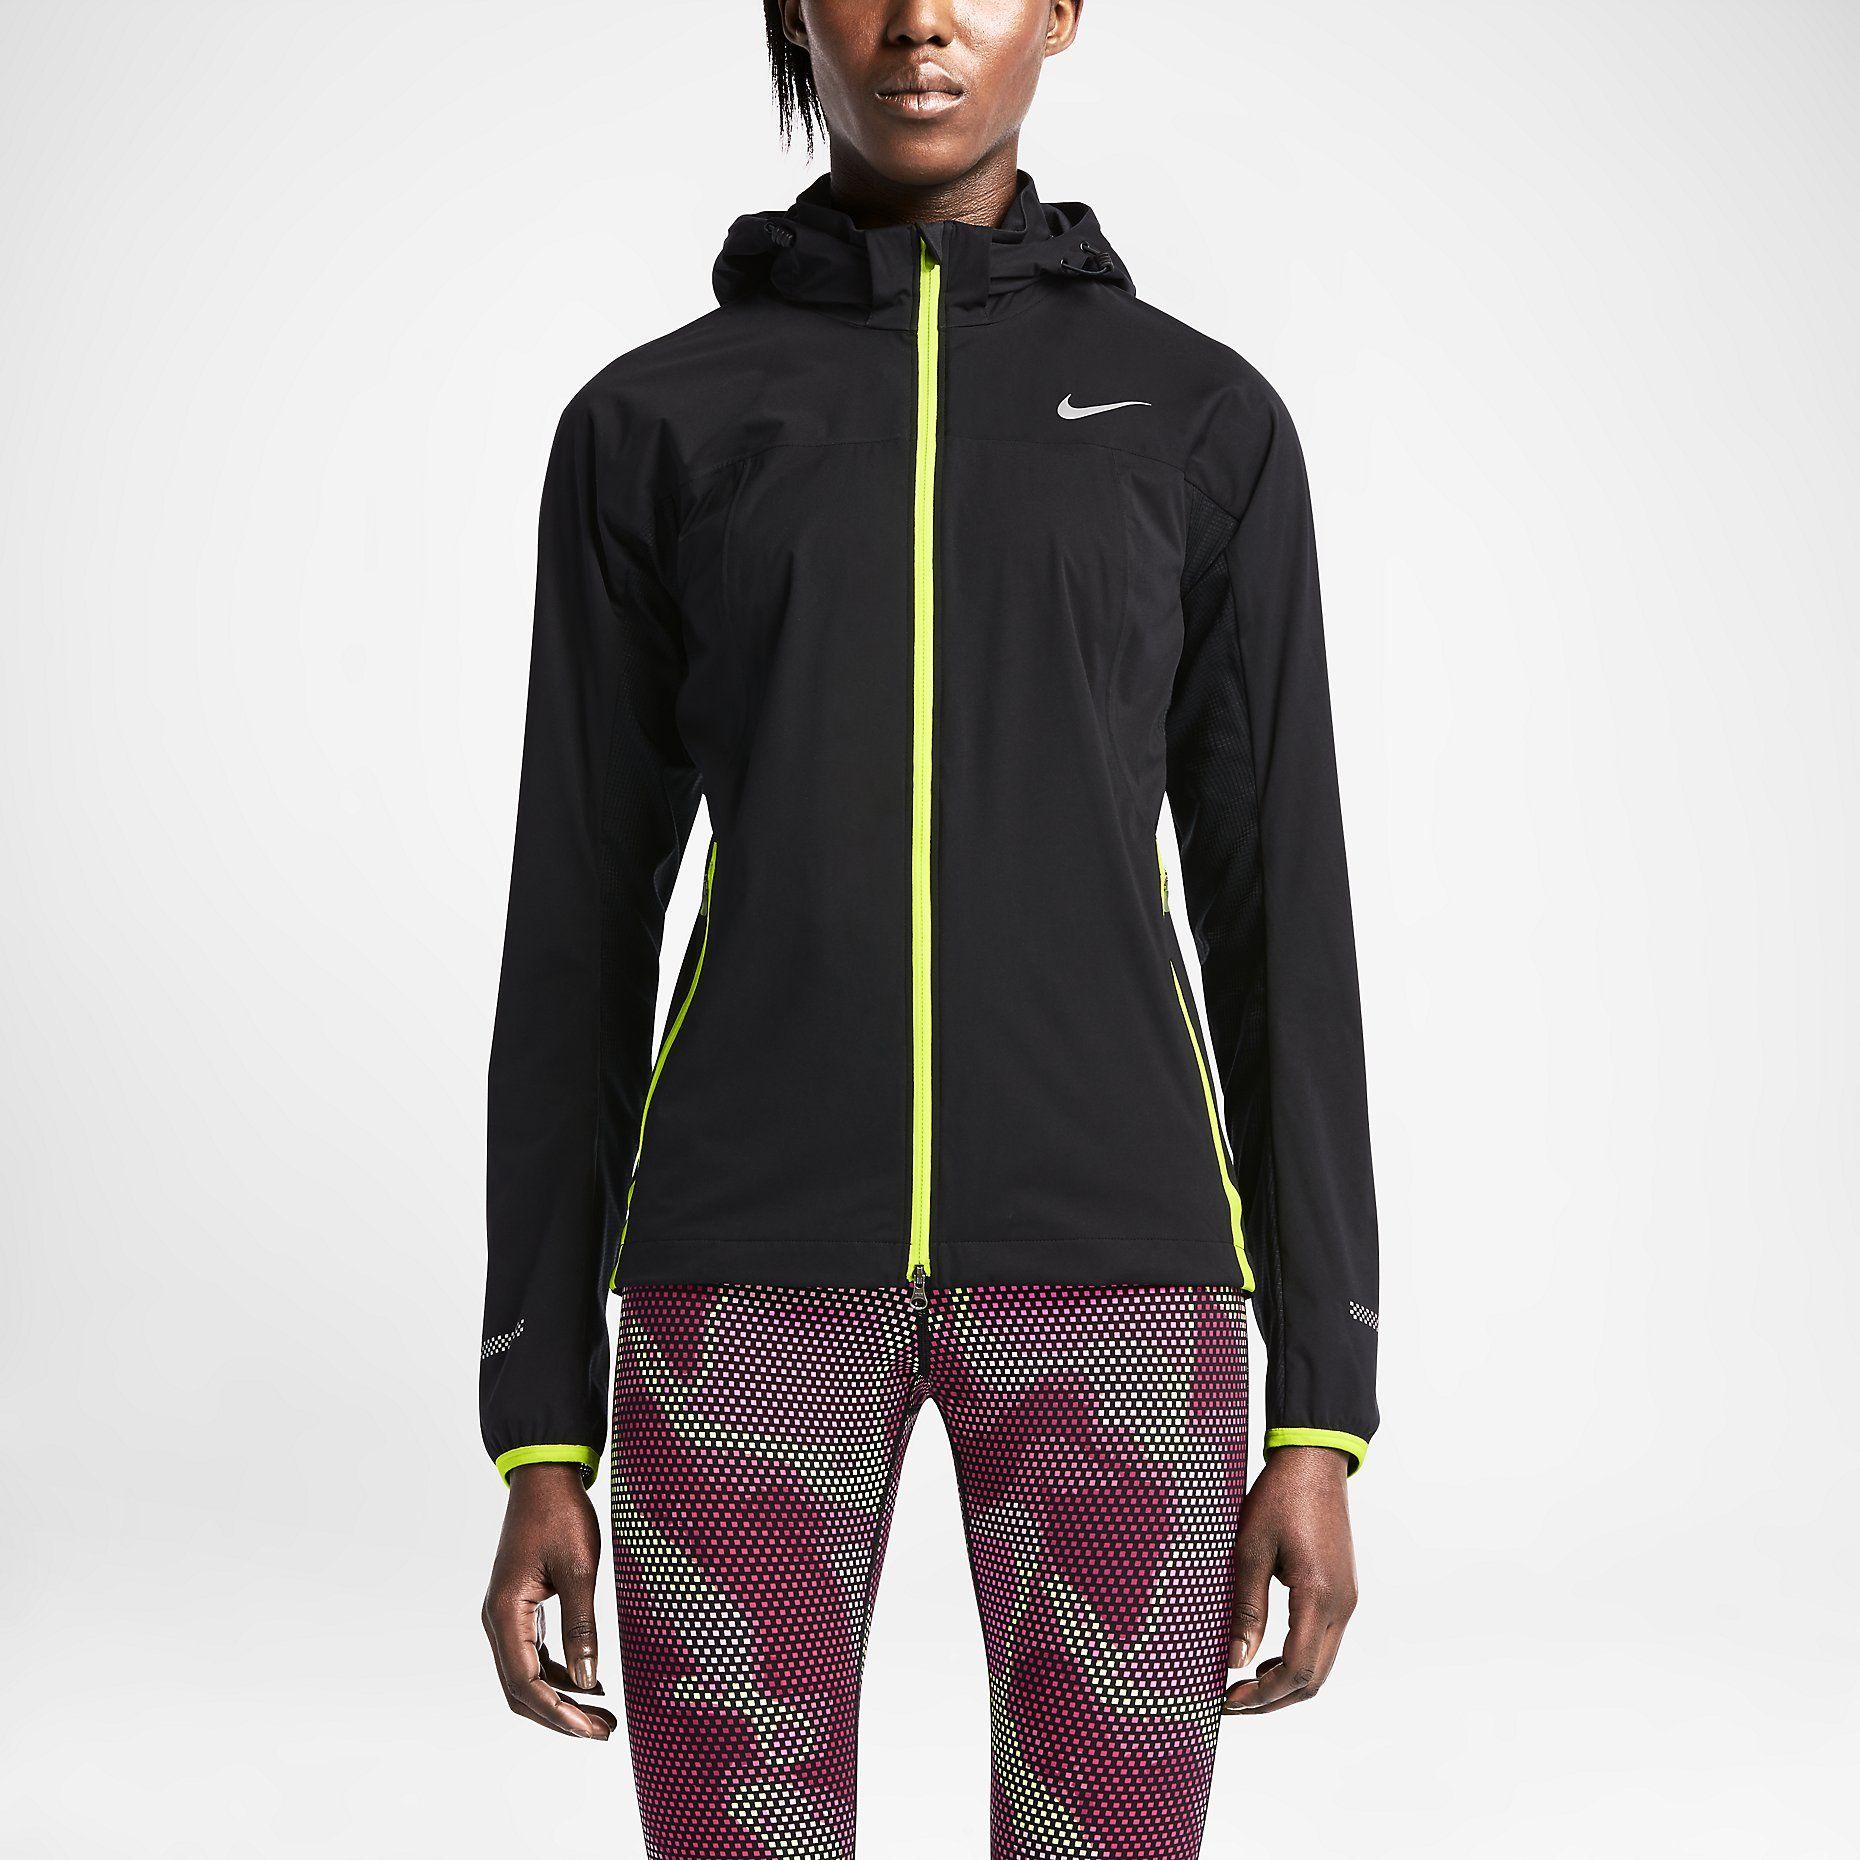 d028880da39a Nike Shield Light Women s Running Jacket. Nike Store